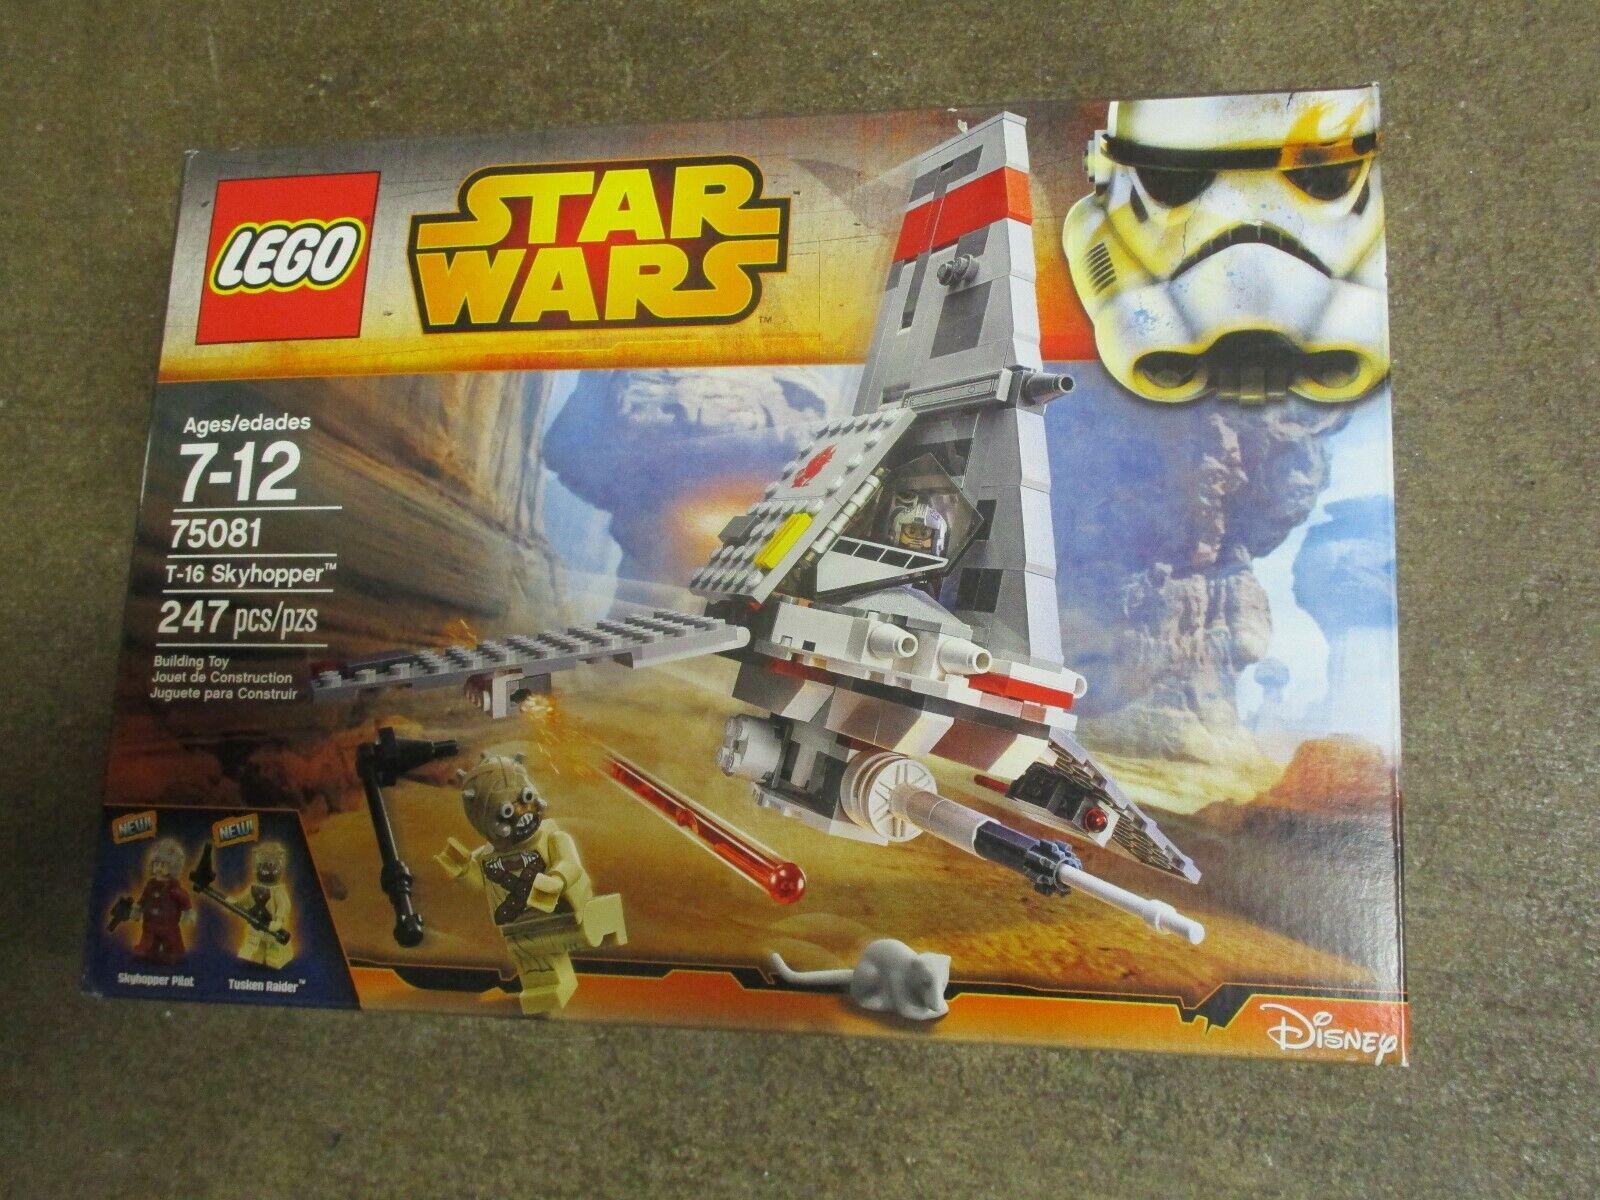 Lego estrella guerras 75081 T16  cielohopper NIB Sealed scatola  vendita con alto sconto